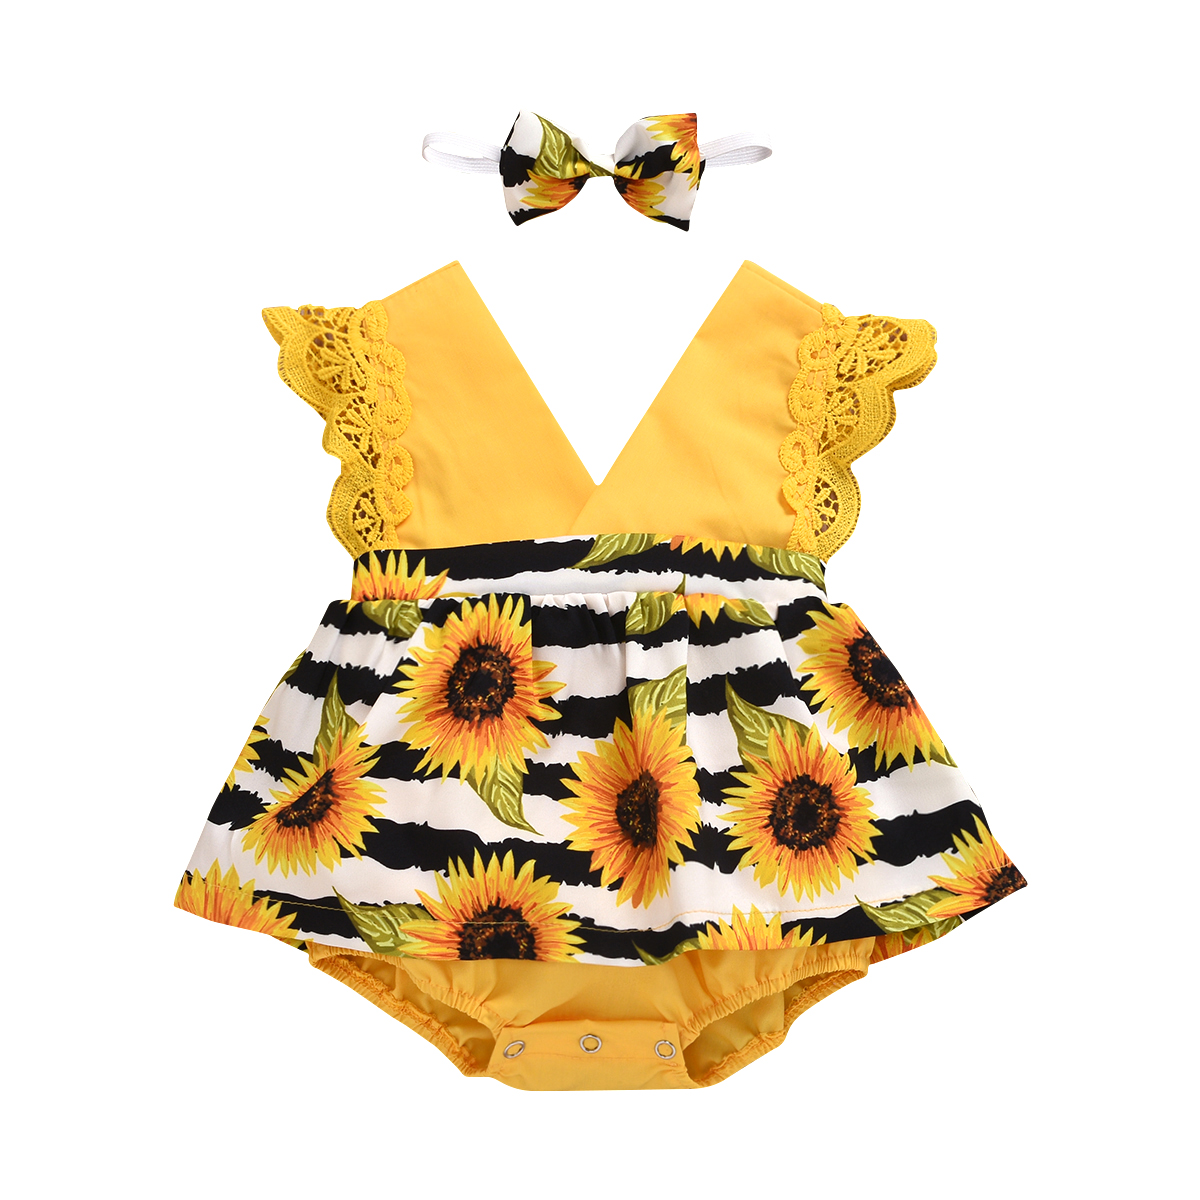 2020 Baby Summer Clothing Infant Newborn Baby Girls Sunflower Lace Bodysuits Dress Striped Jumpsuits Sleeveless Sunsuit Headband